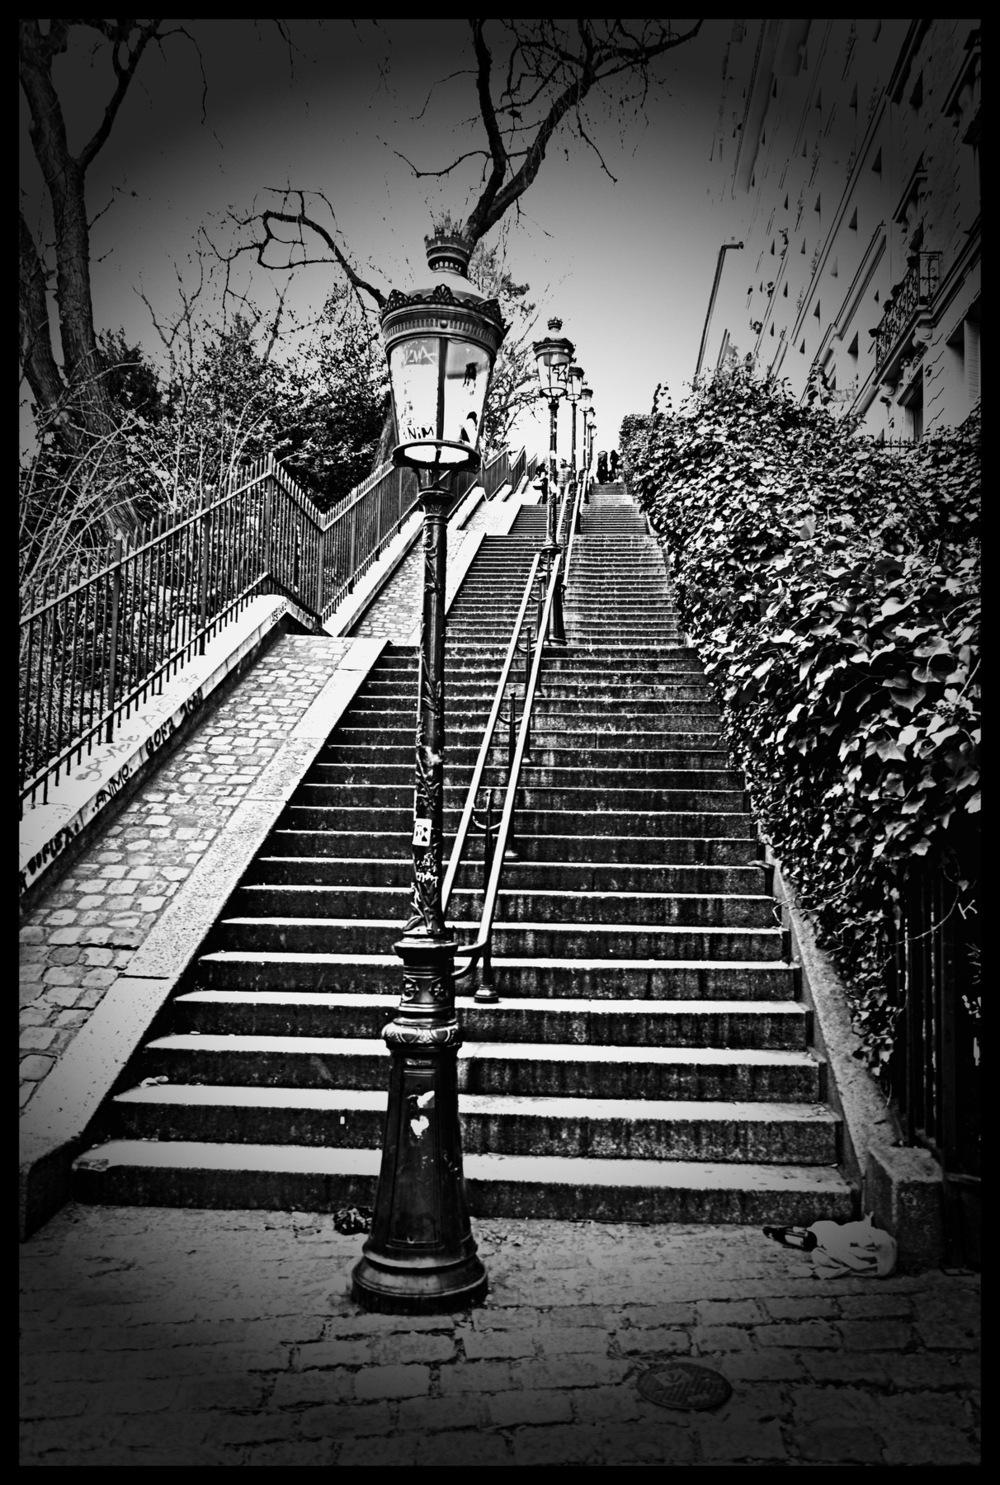 tania karaportfoliobox.fr - escalier de Montmartre II